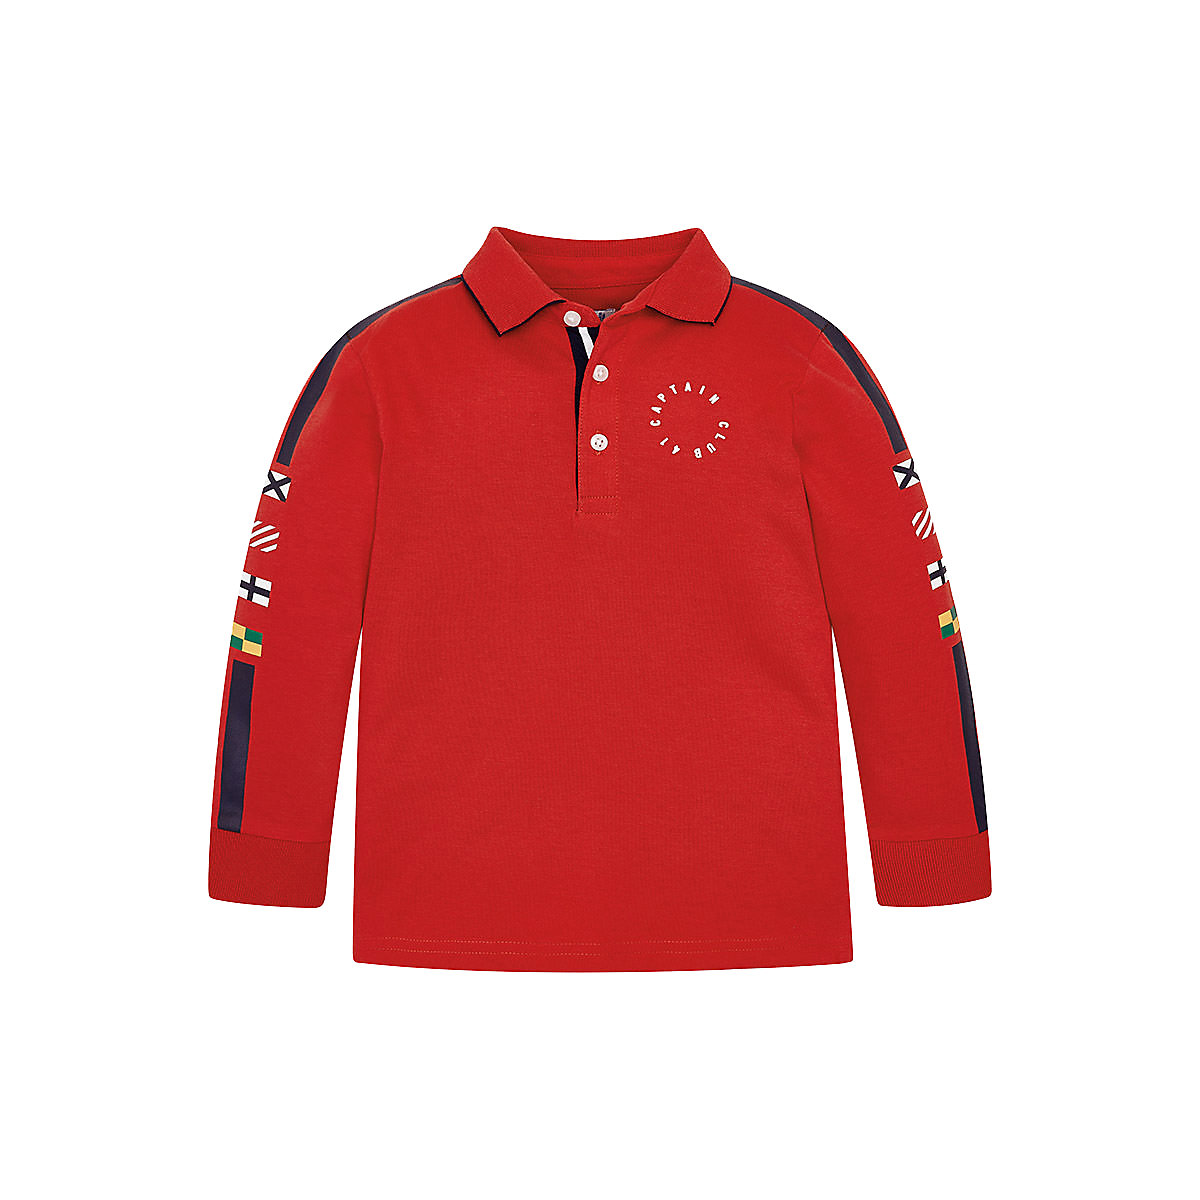 MAYORAL Polo Shirts 10681478 children clothing t-shirt shirt the print for boys